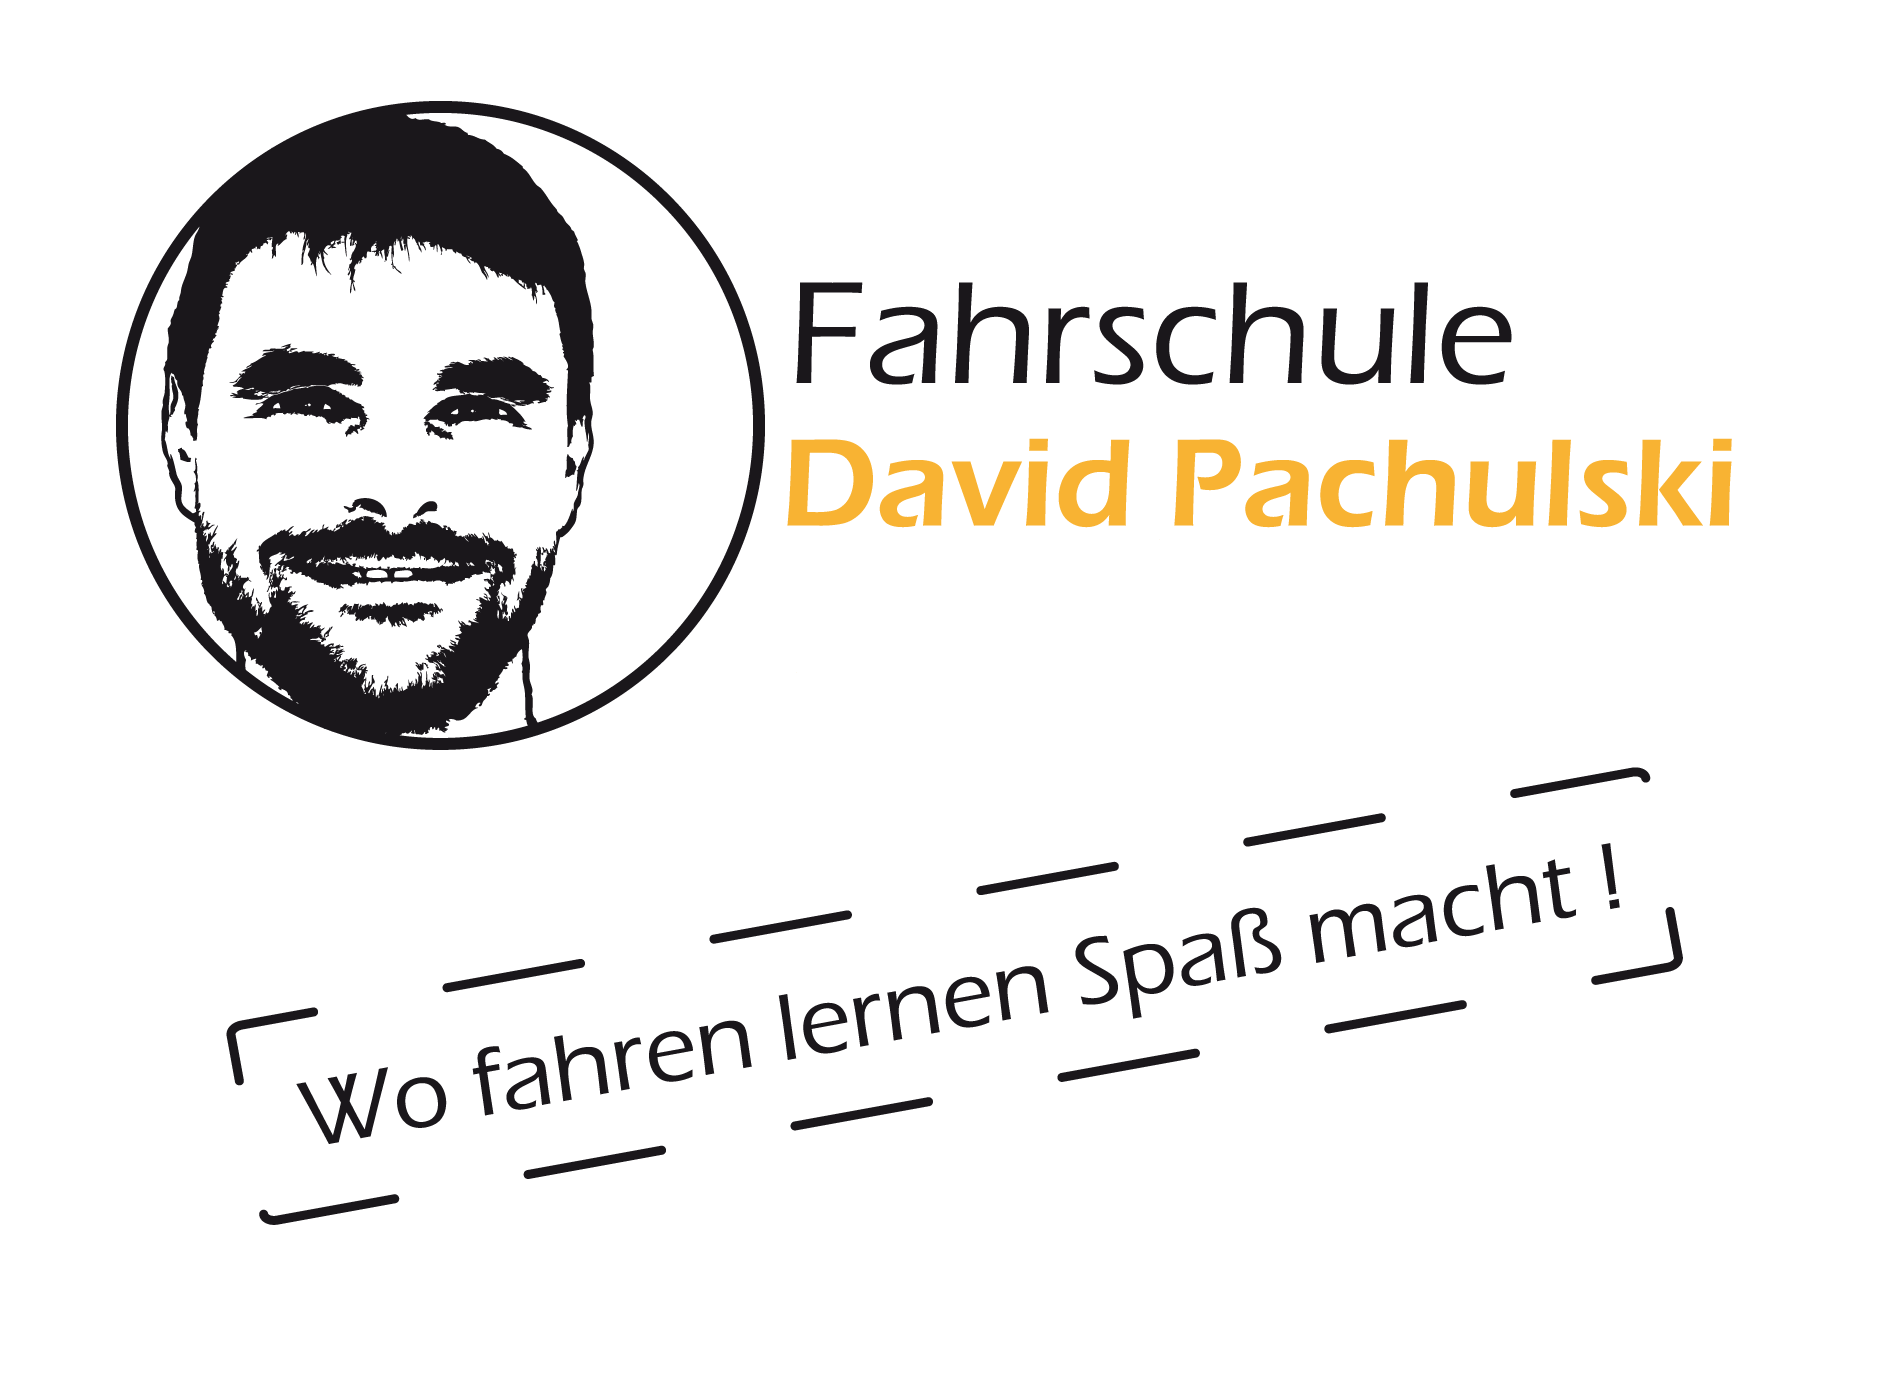 Fahrschule David Pachulski